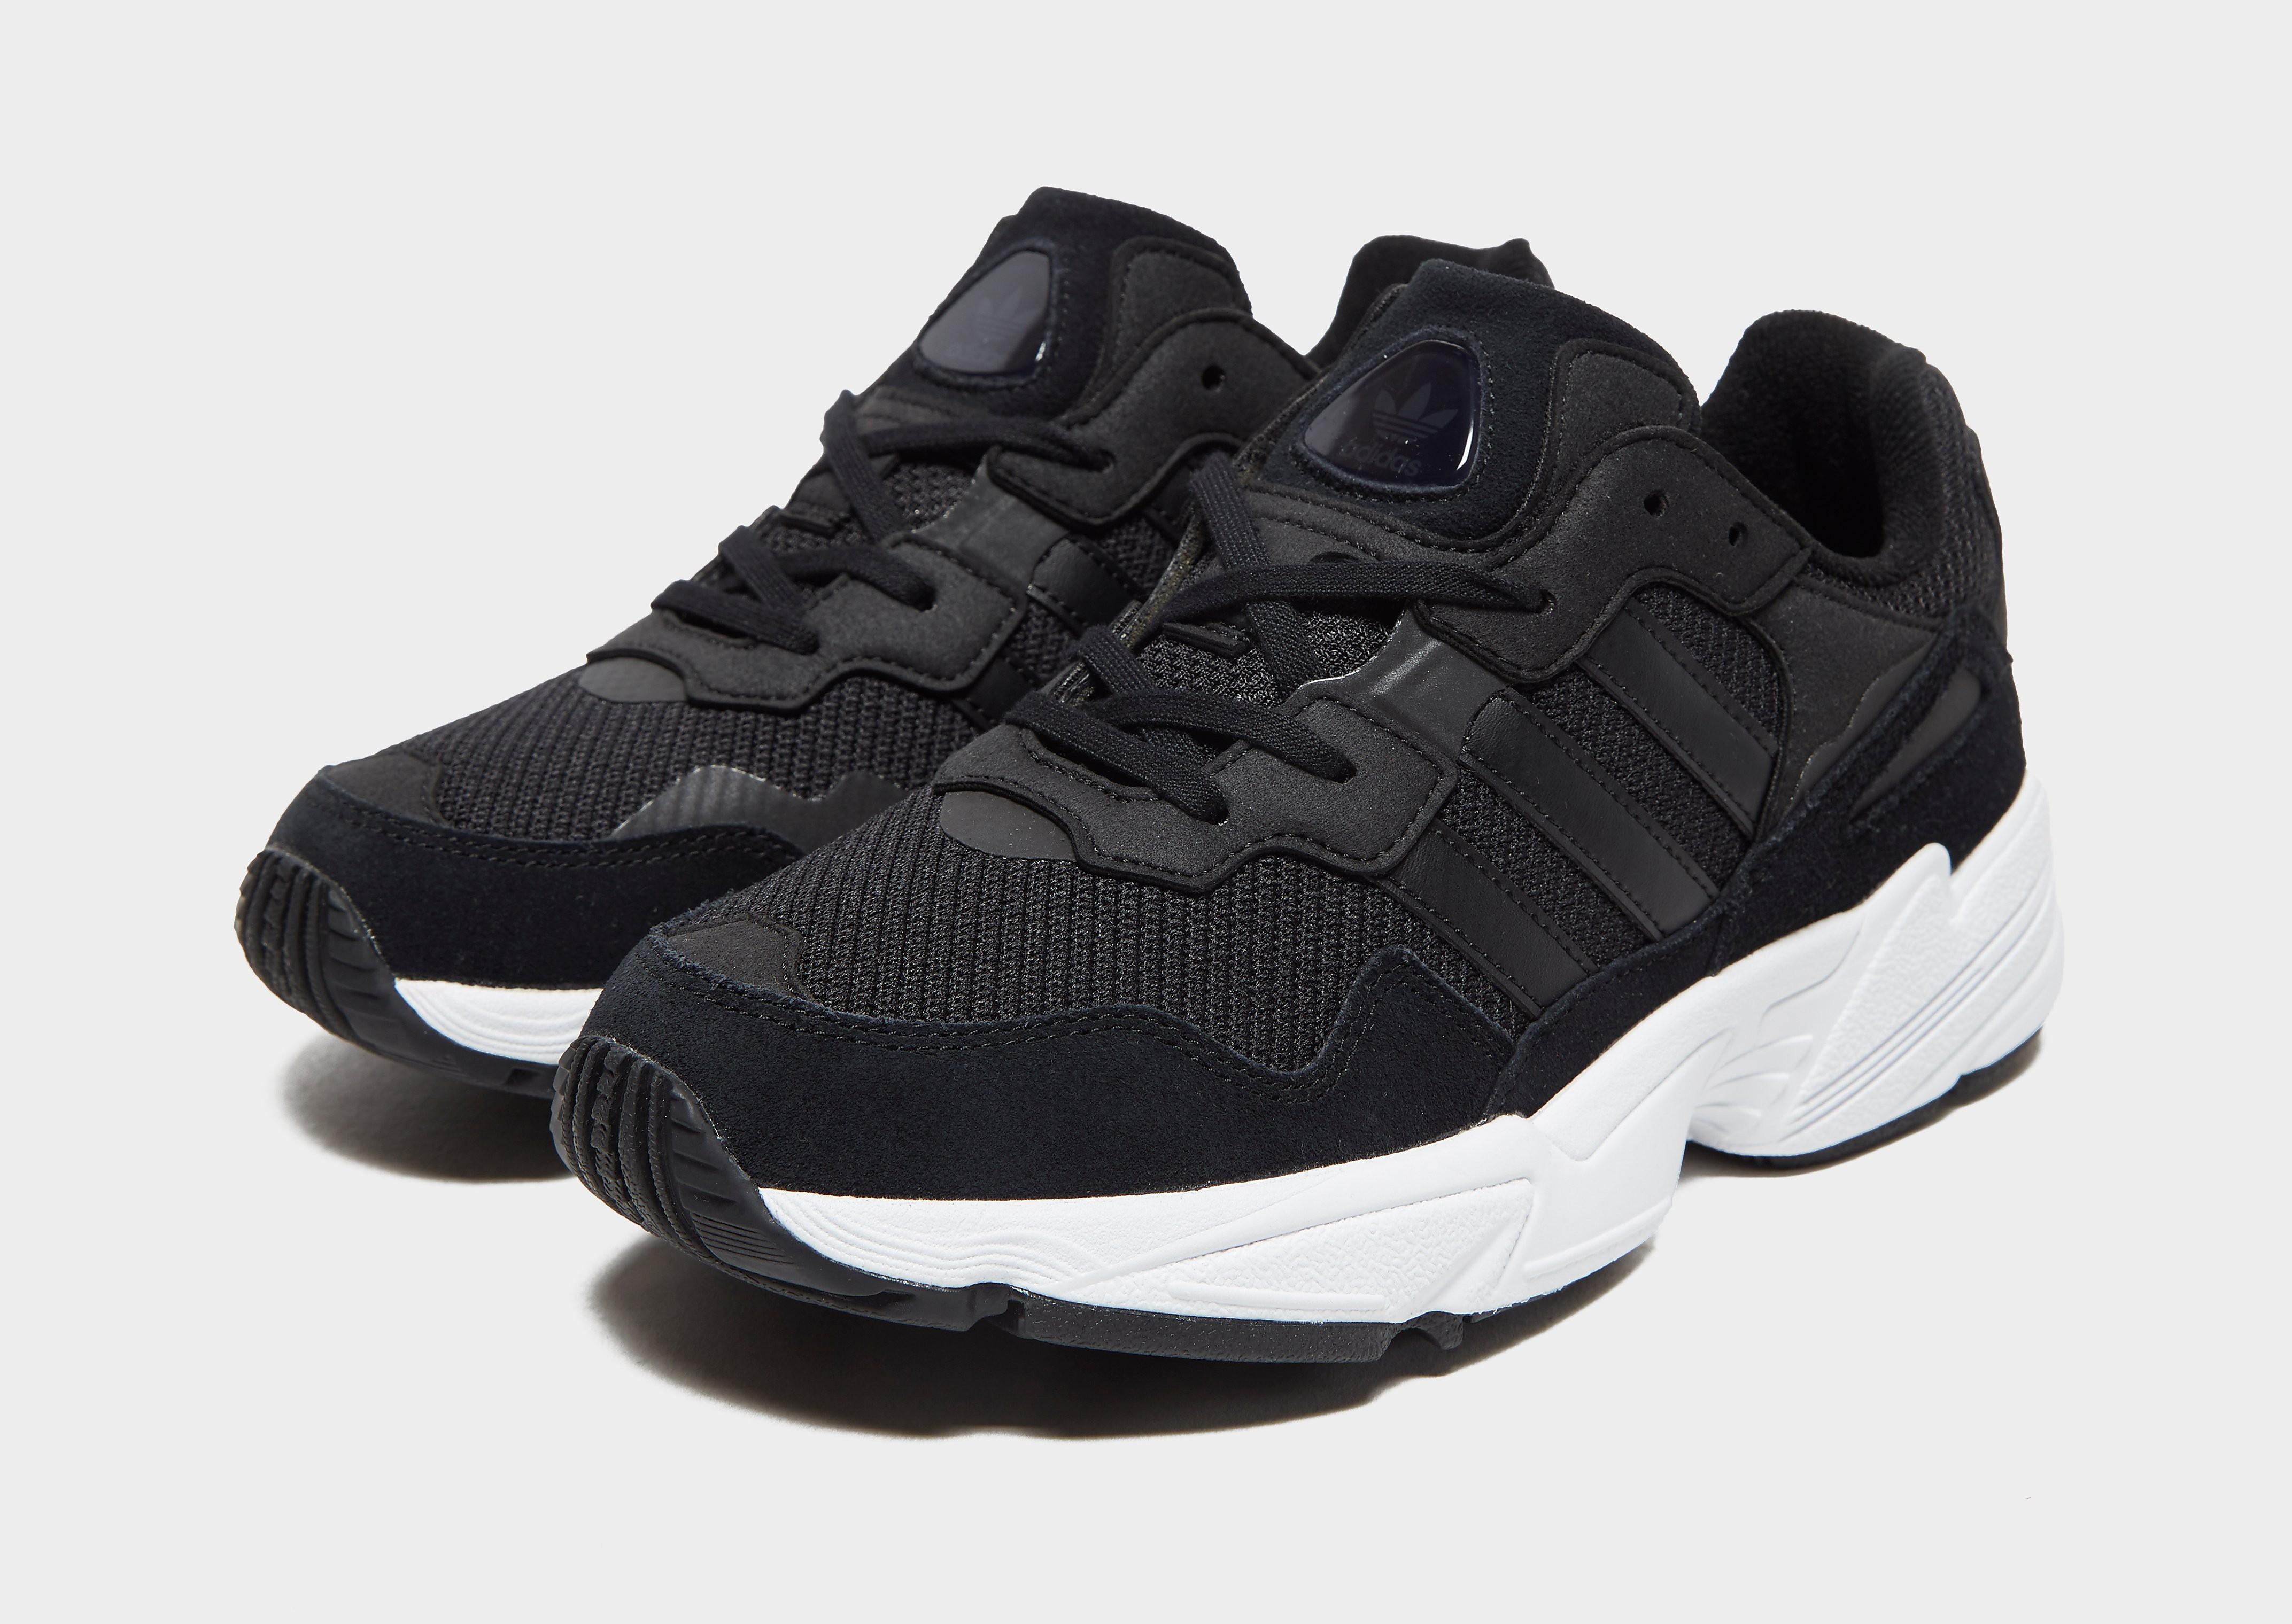 Adidas Originals Yung 96 Jd Sports